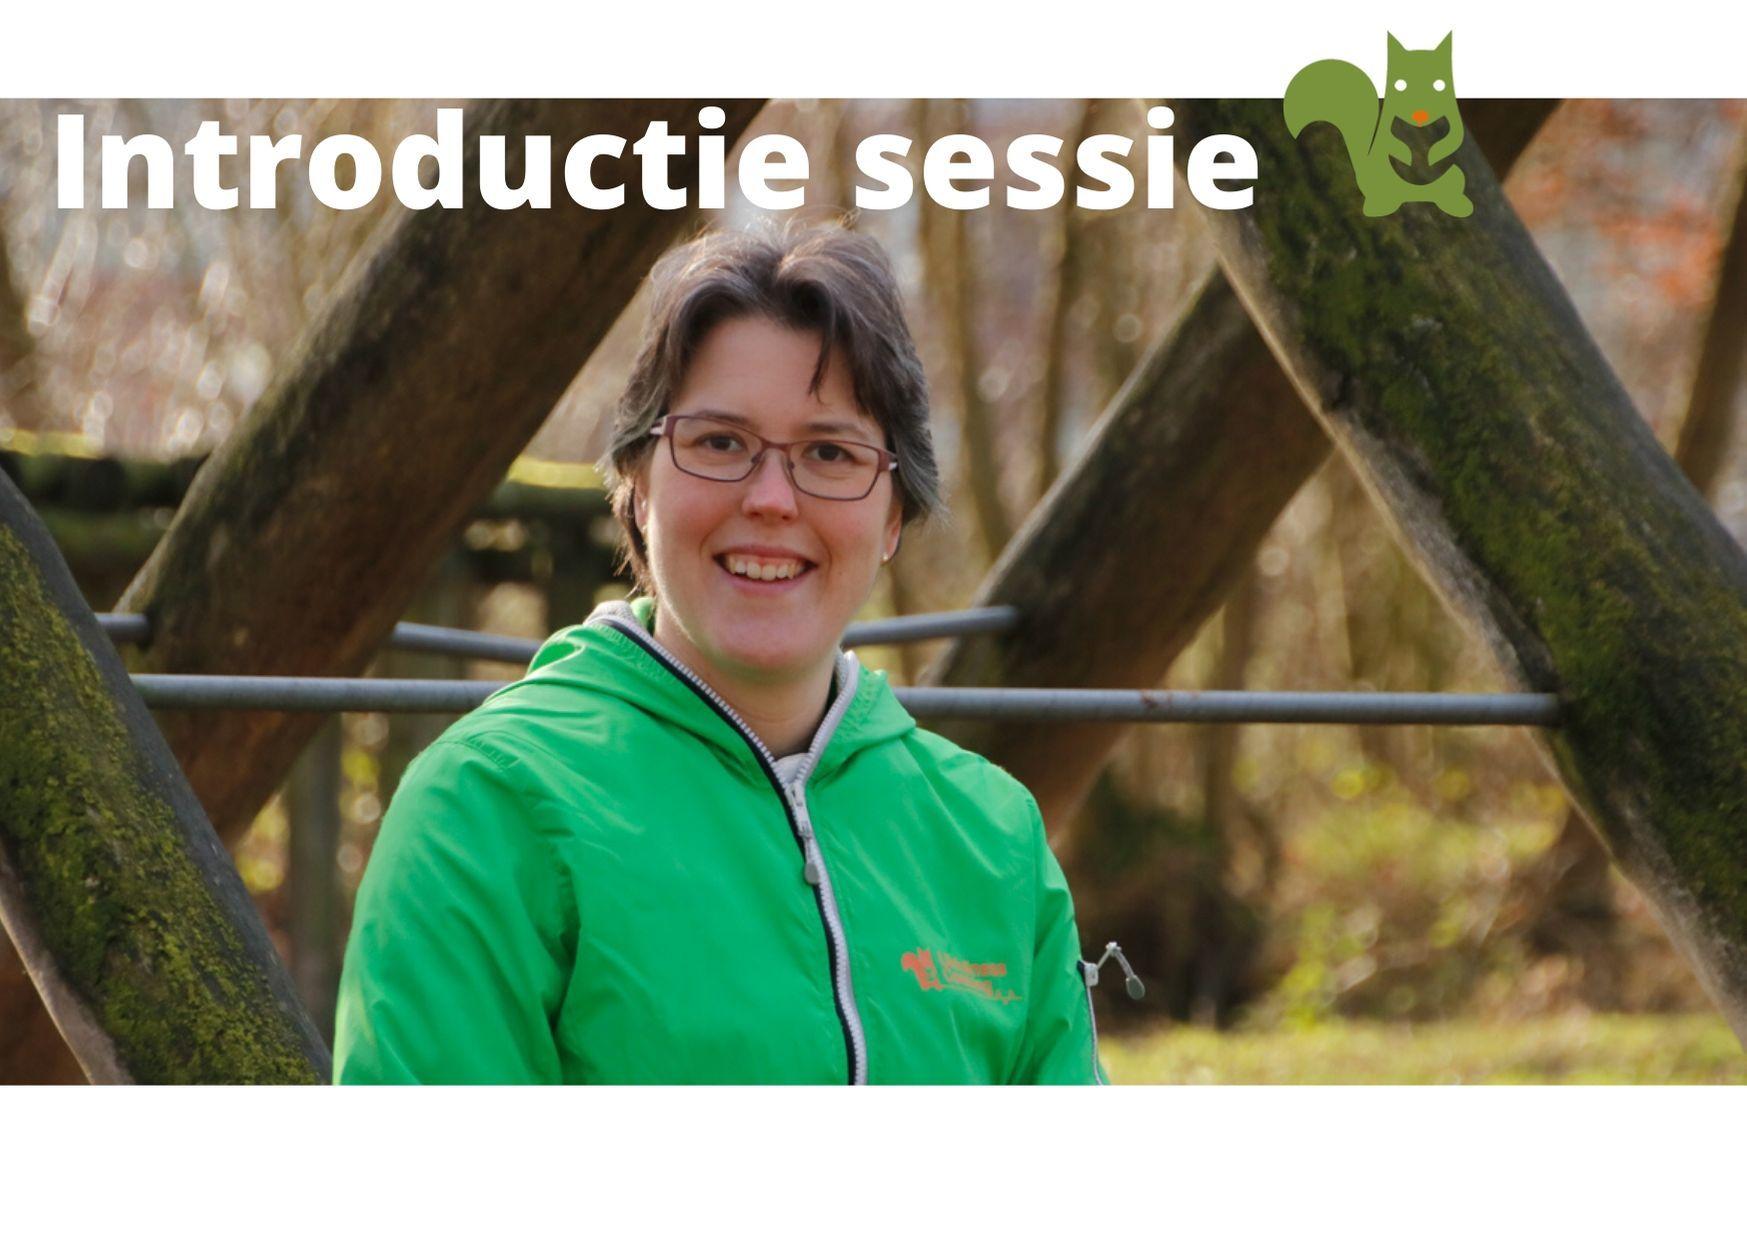 Introductie sessie - Lifefullness Coaching